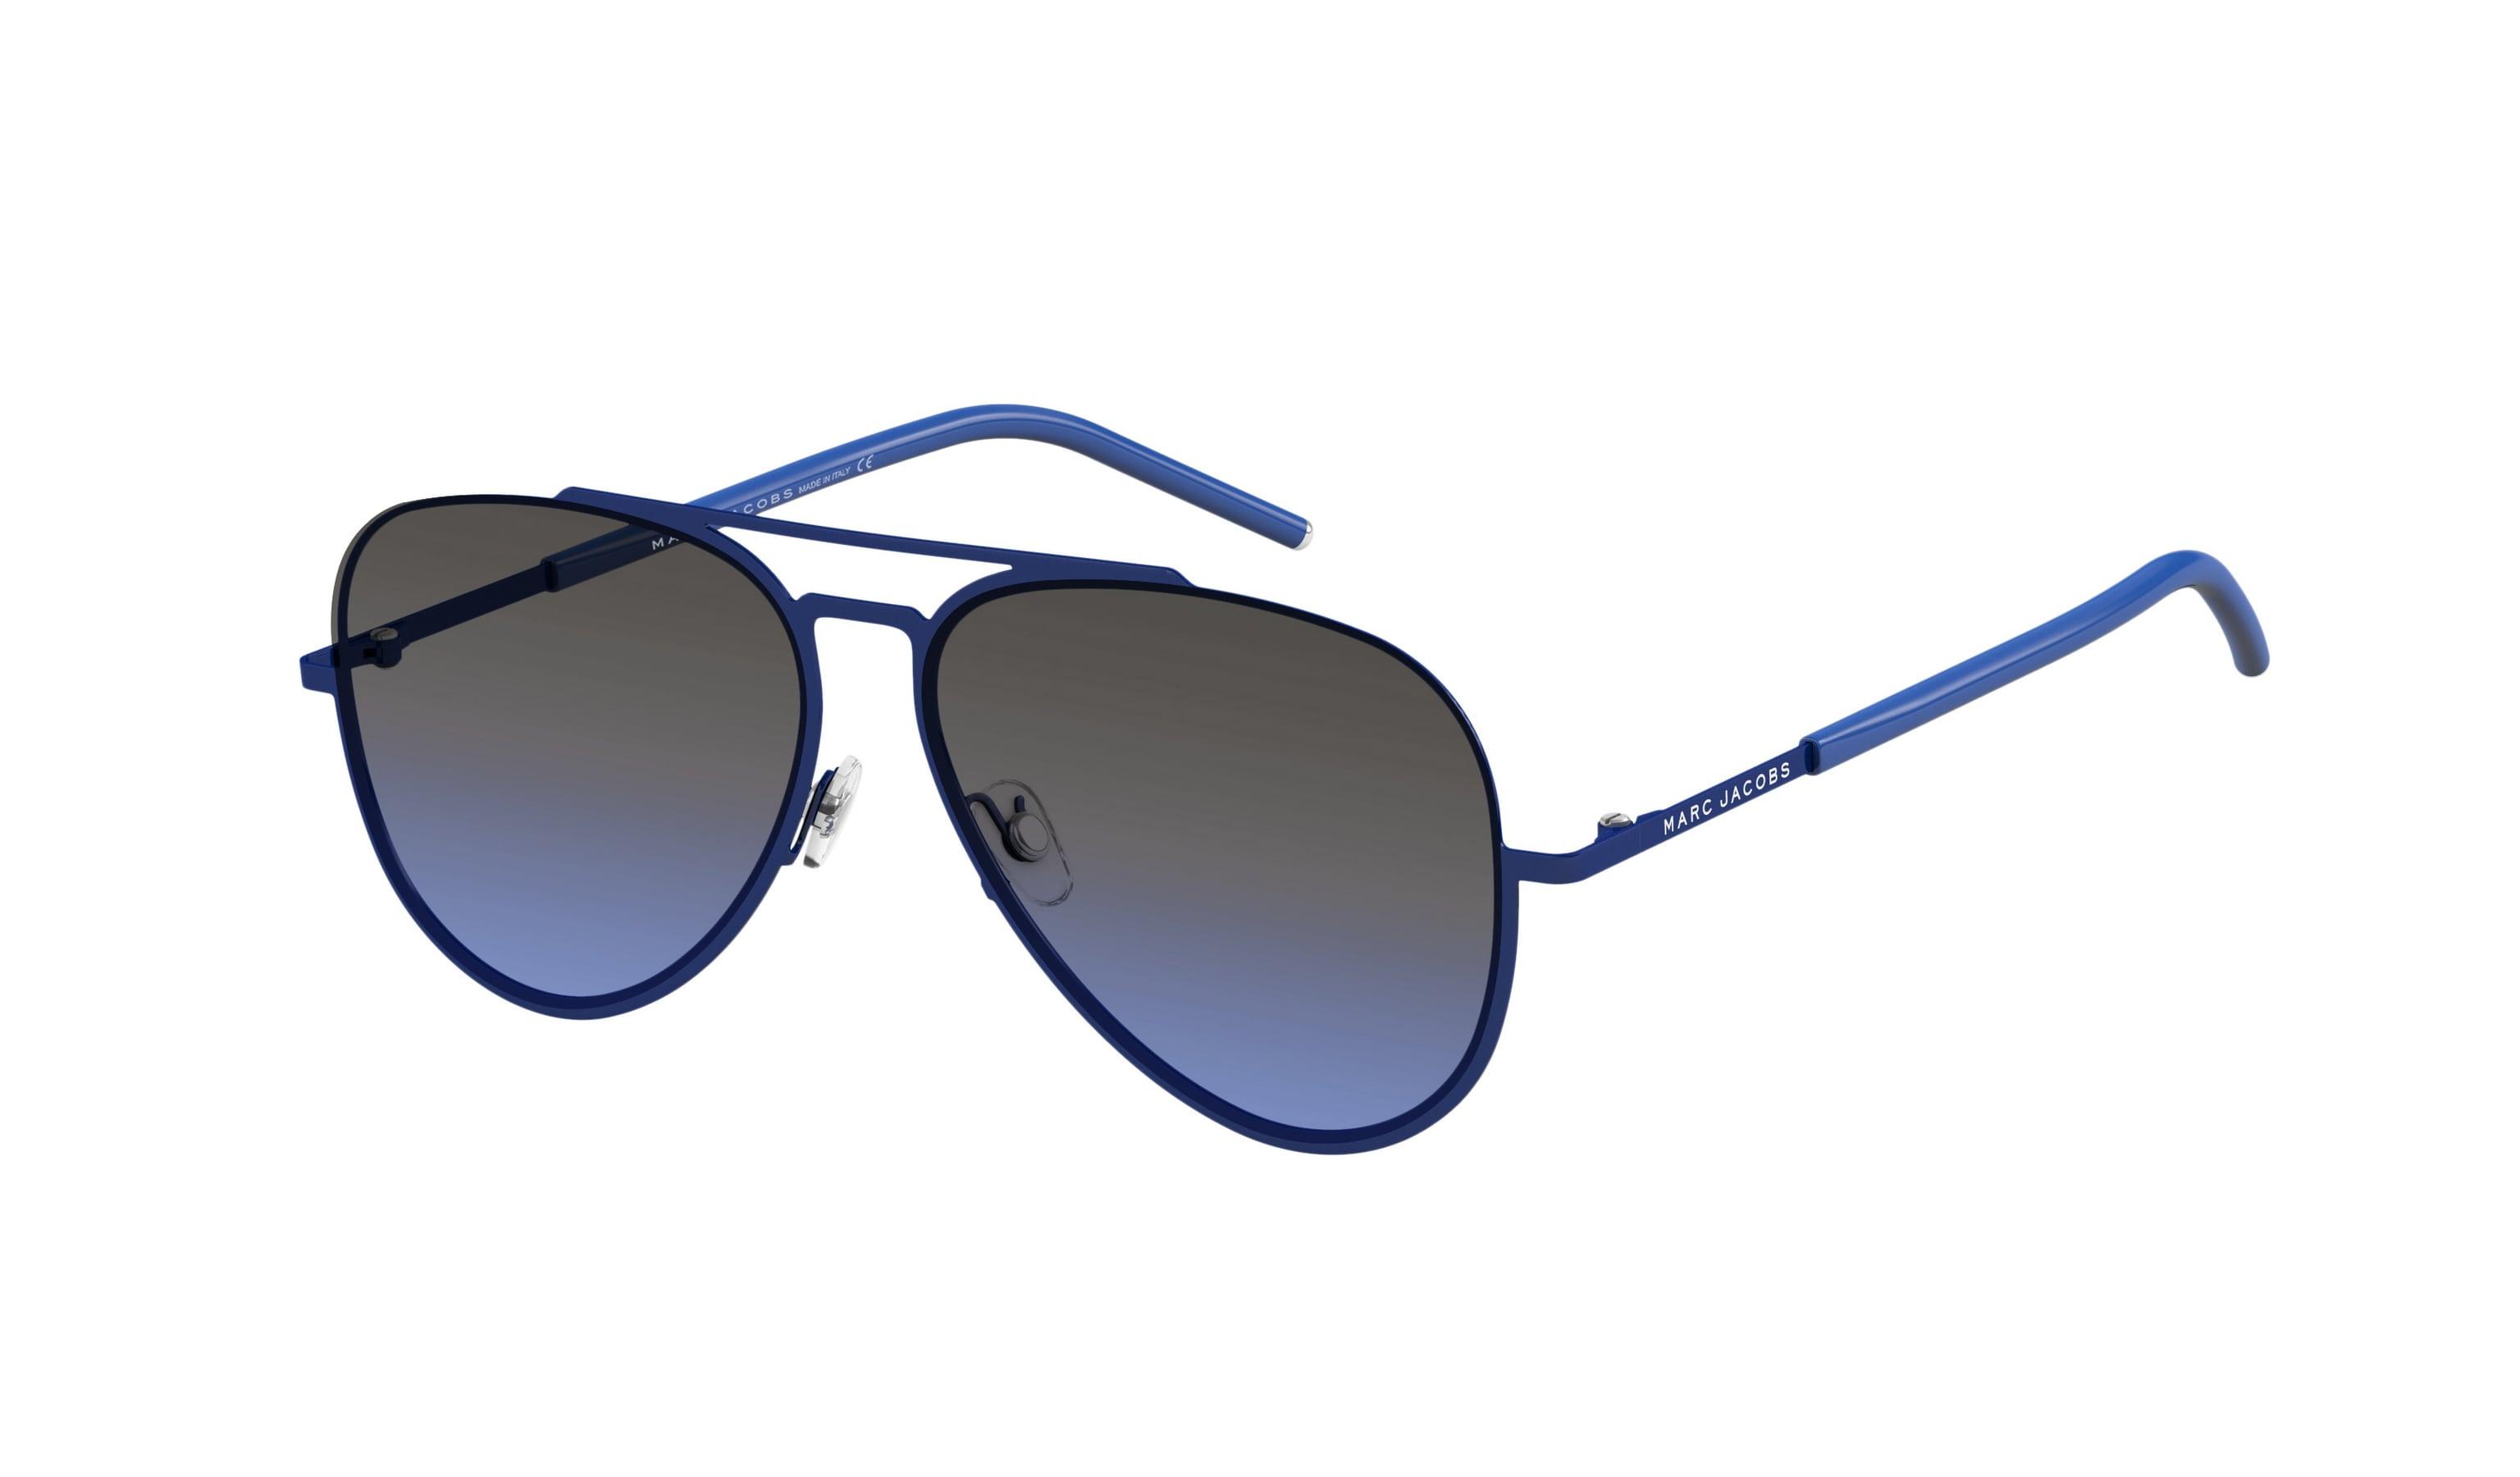 a1f6c5c014 Marc Jacobs συλλογή γυαλιών άνοιξη καλοκαίρι 2016 - Efthimis is around